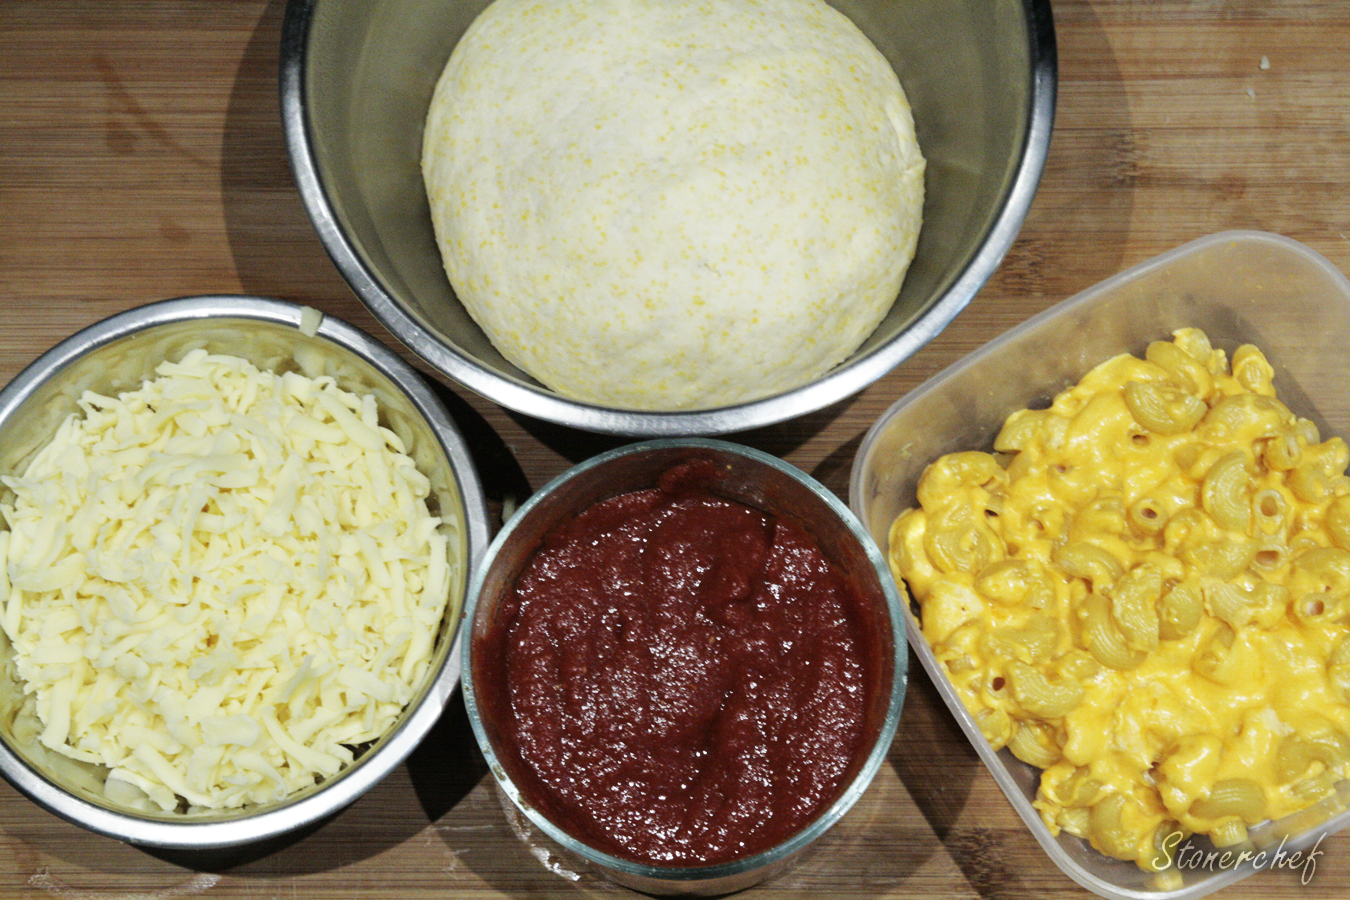 składniki na dip dish mac and cheese pizza